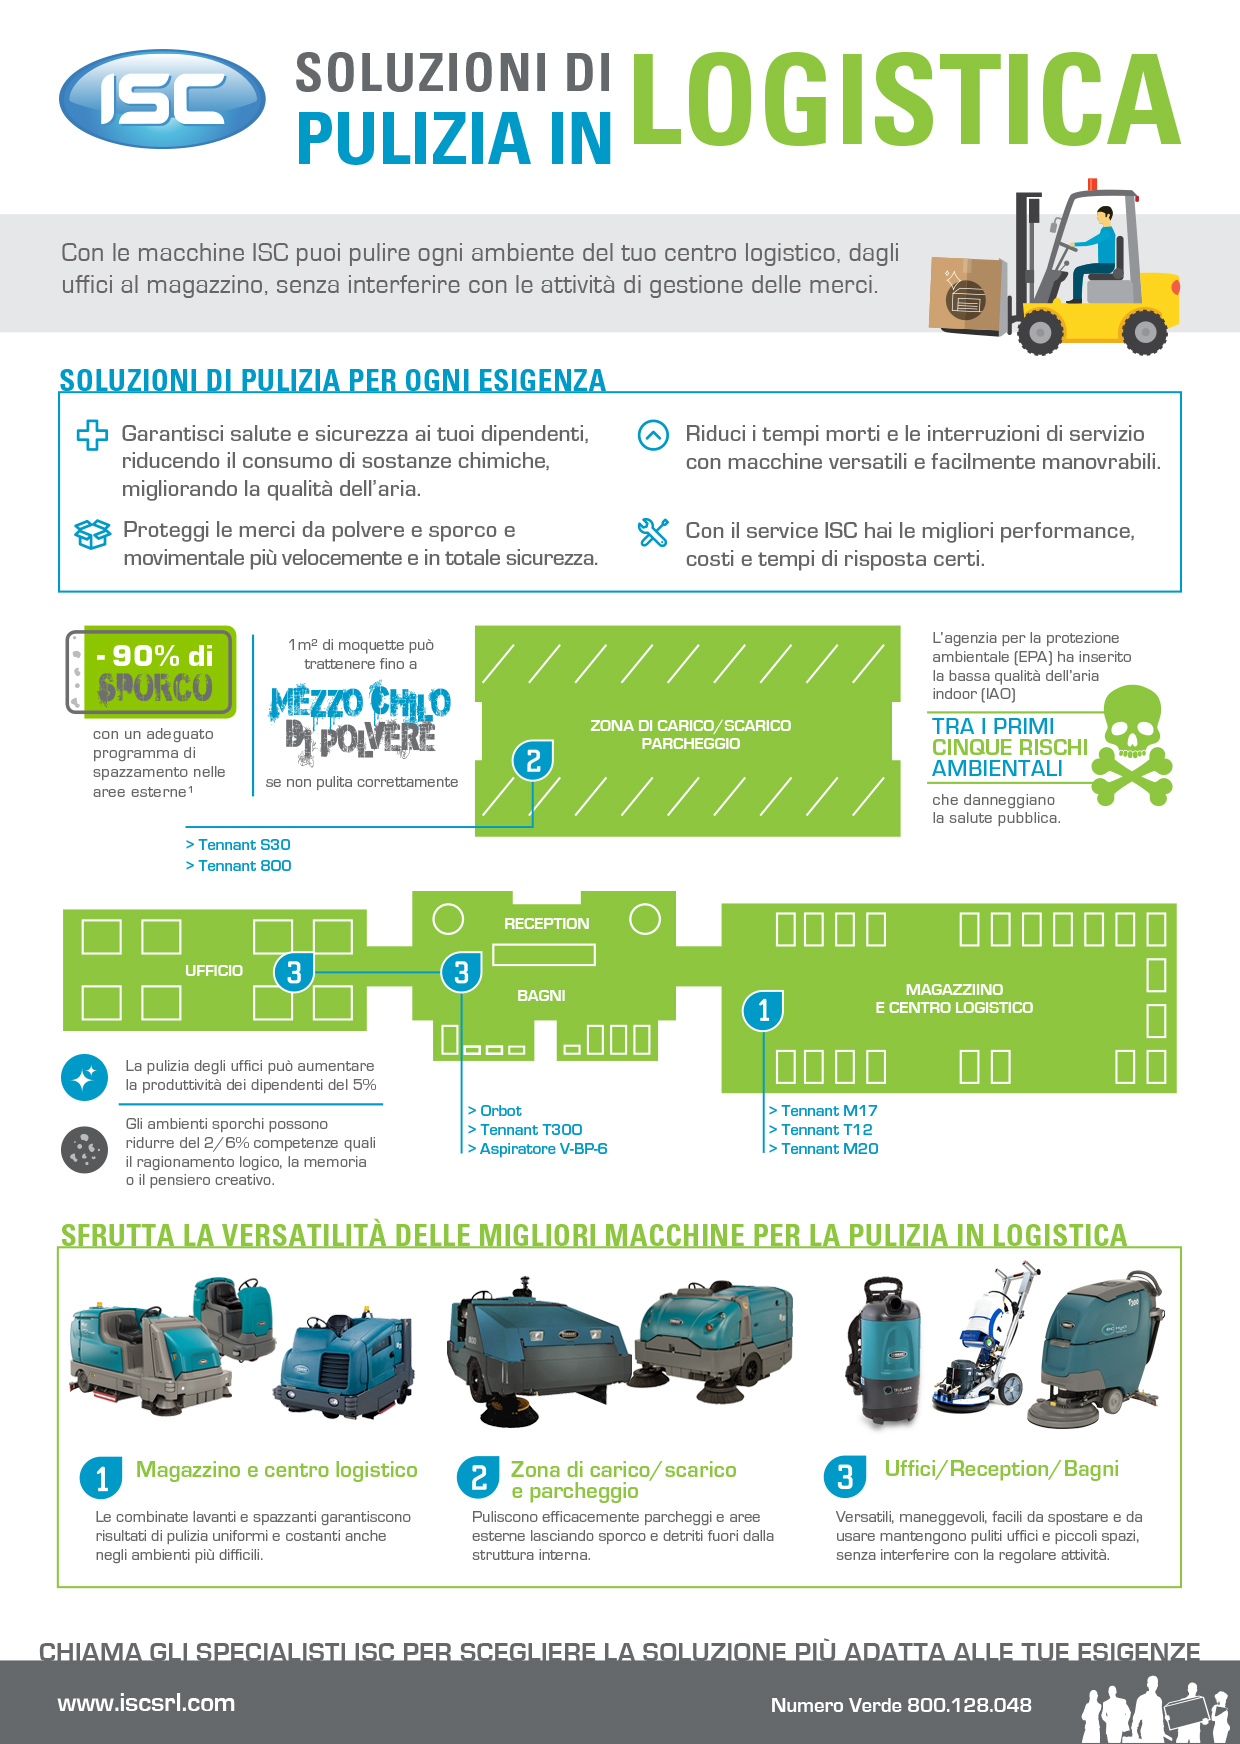 Infografica pulizia in logistica